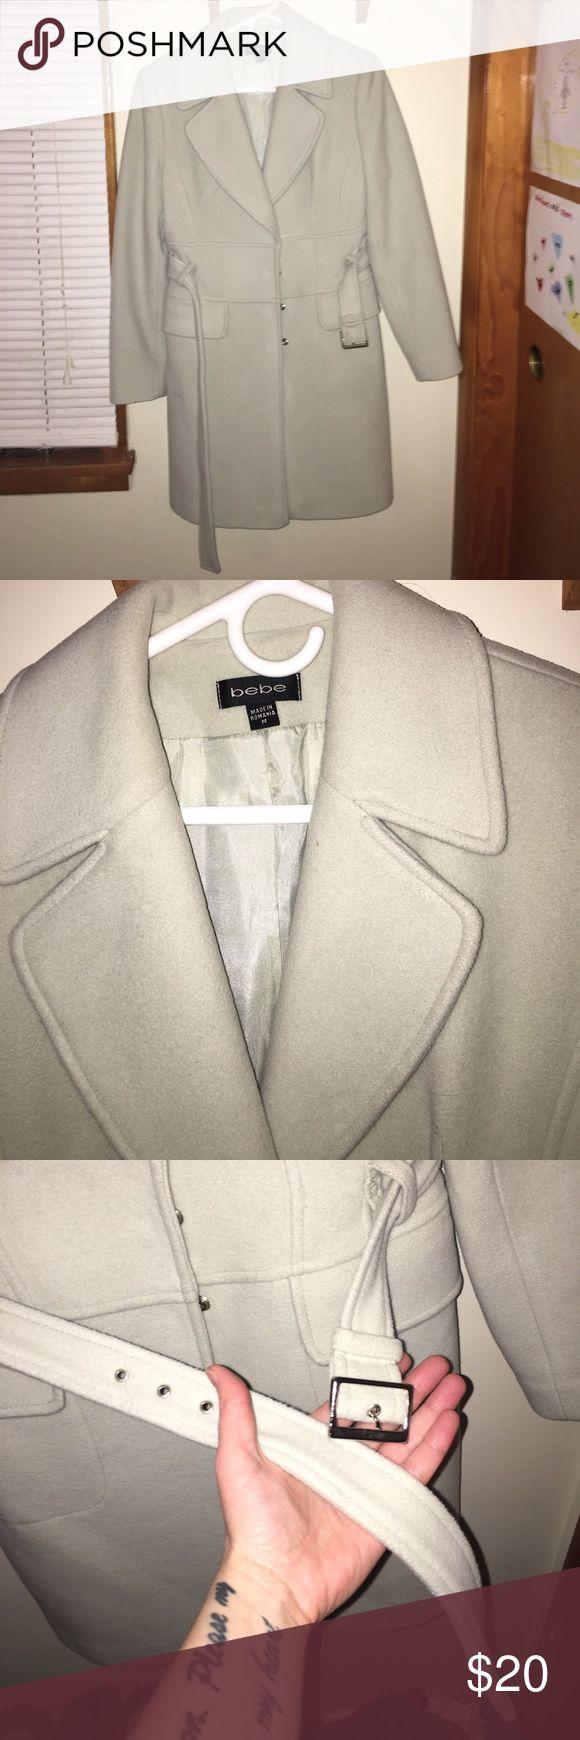 Bebe Women's Coat Pale mint green Bebe wool coat. Knee length. Only worn 3x. bebe Jackets & Coats Trench Coats